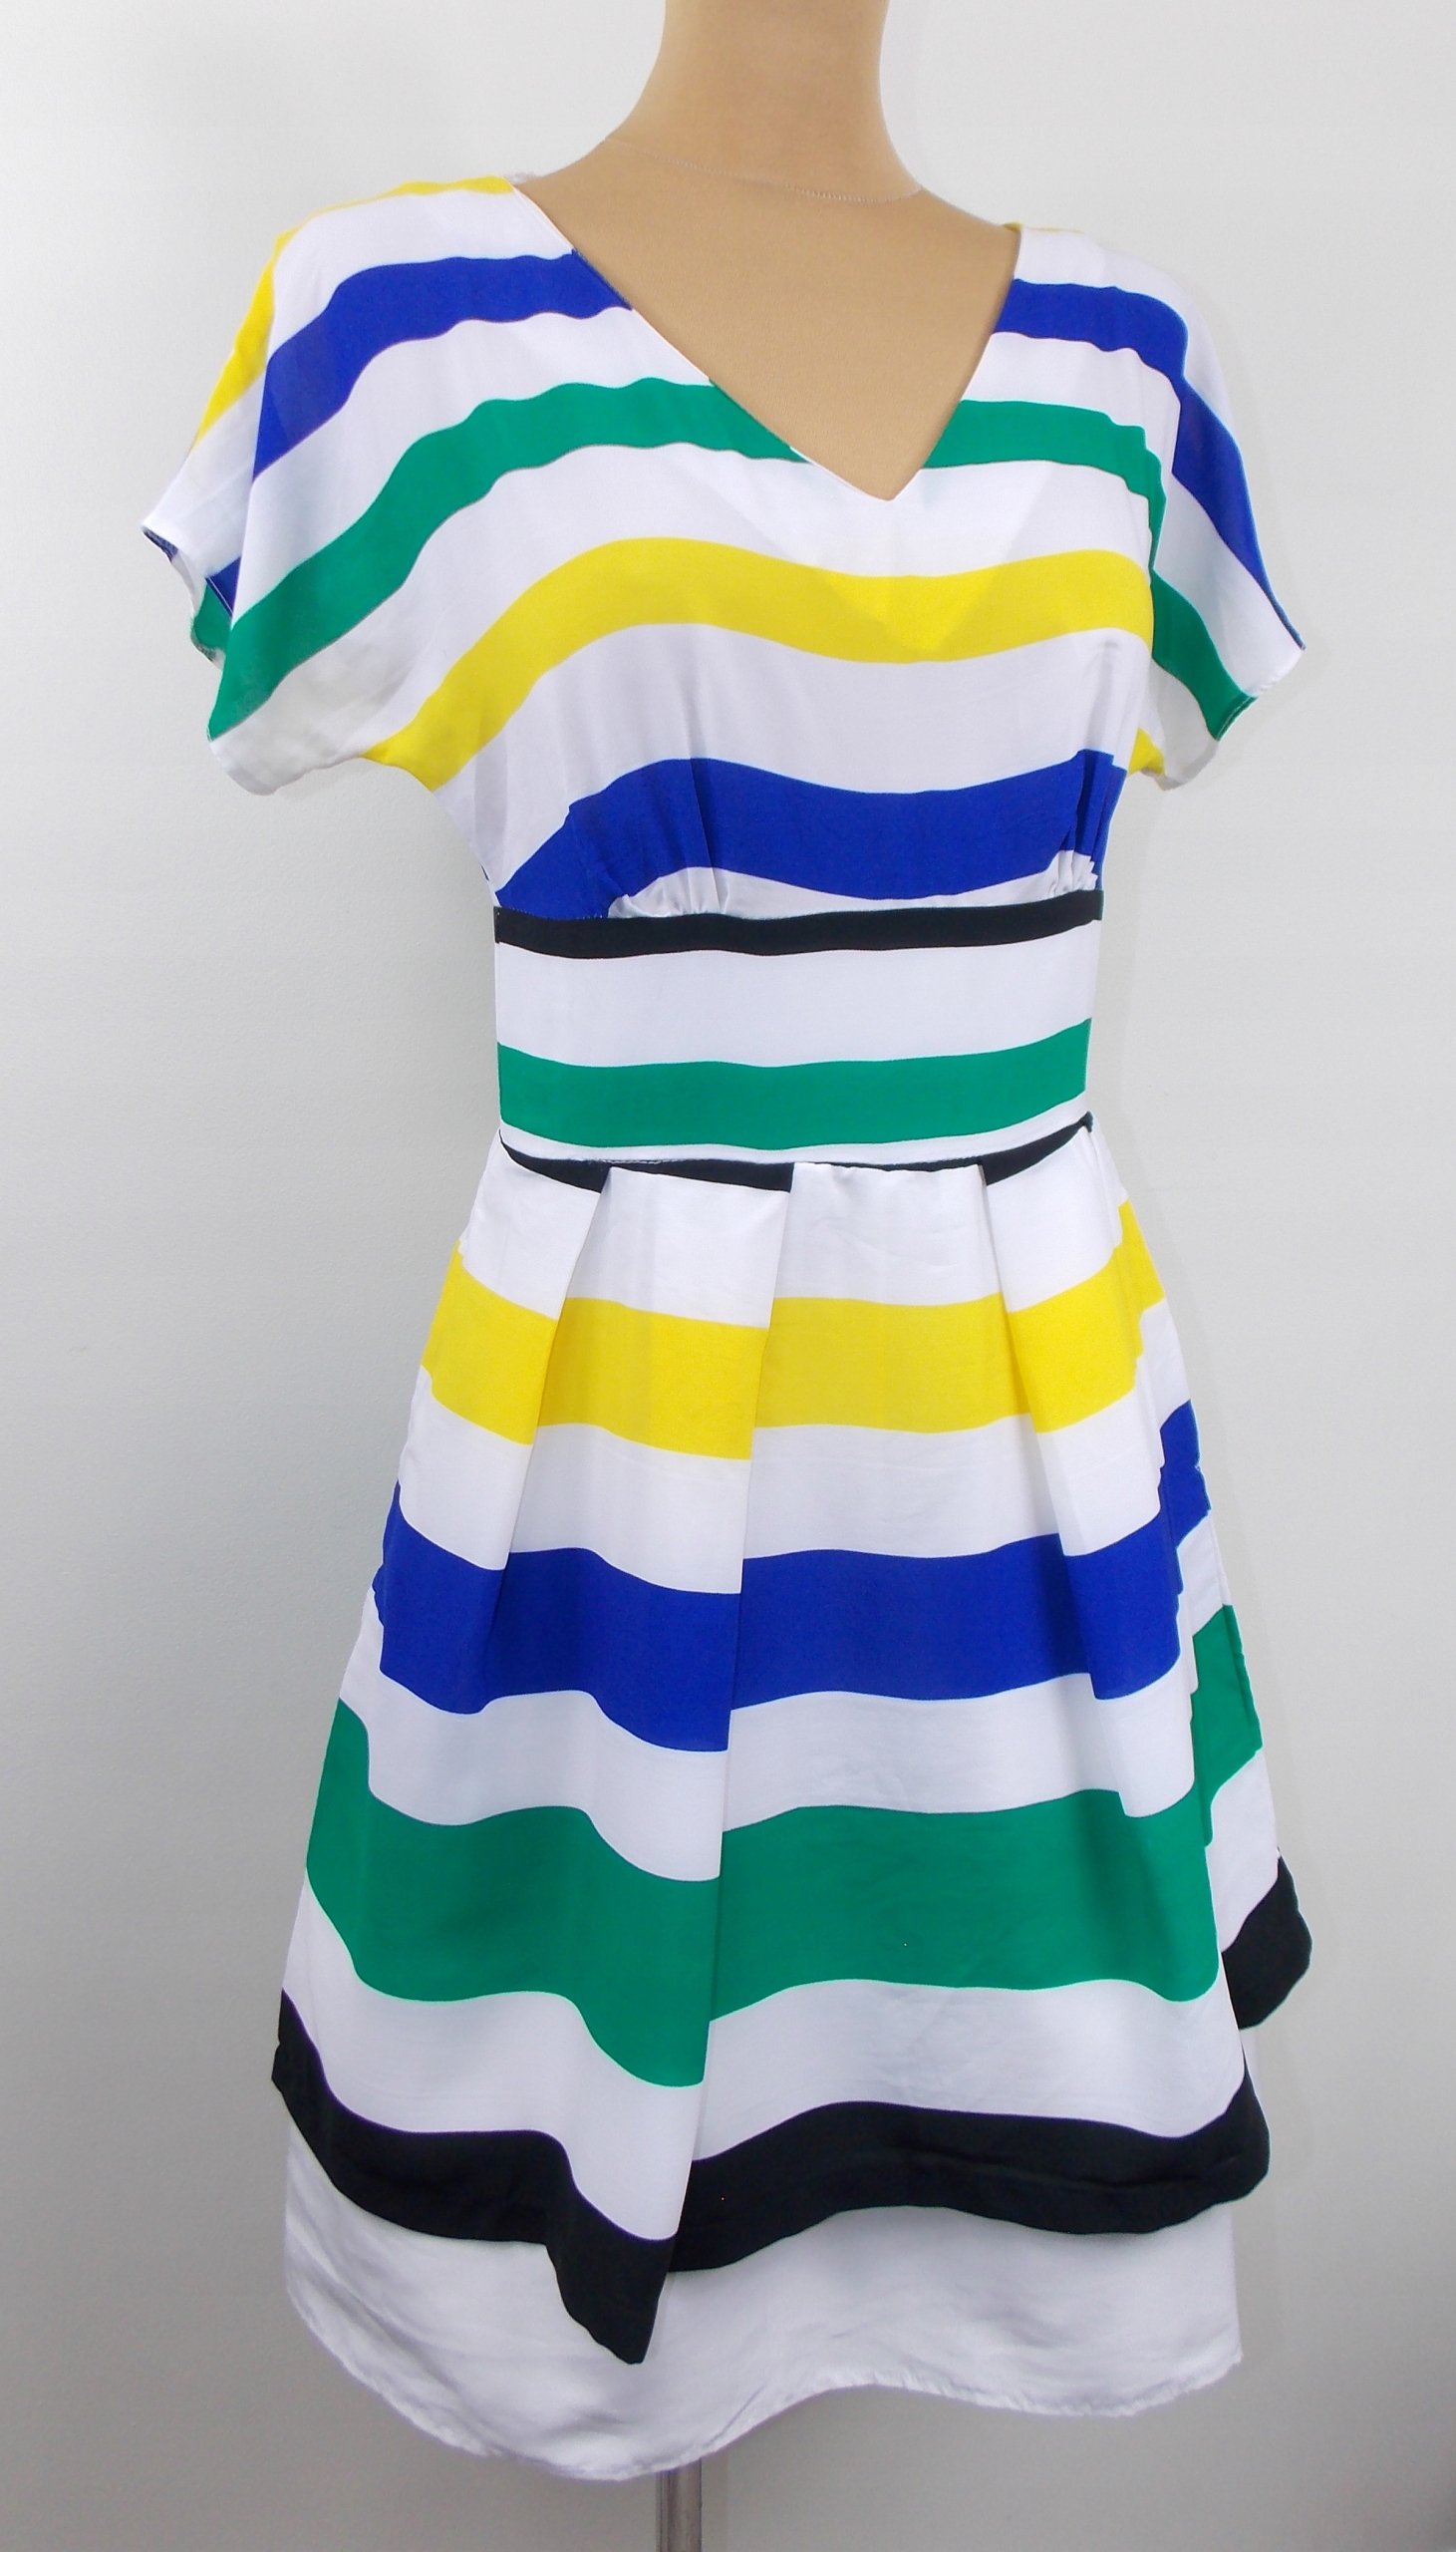 sukienka CLOSET styl ASOS elegancka biuro paski 36